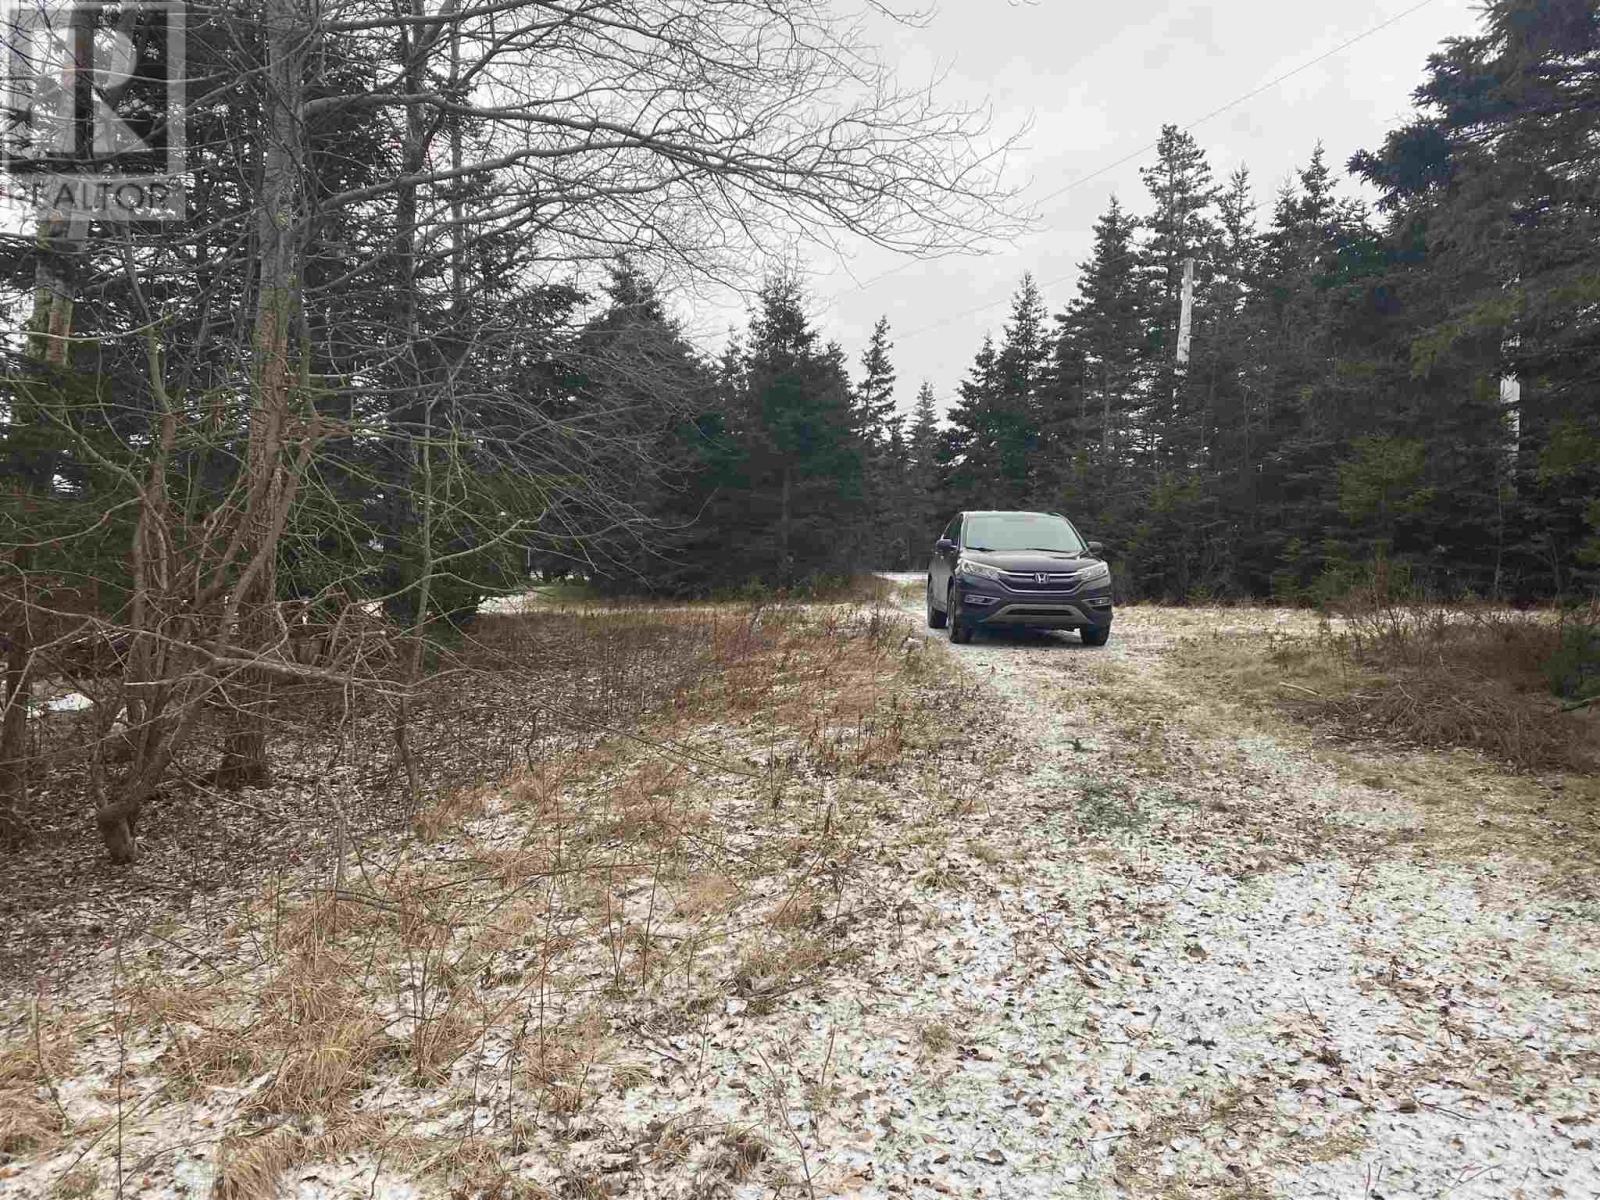 1727 Highway 206, West Arichat, Nova Scotia  B0E 3J0 - Photo 14 - 202101595